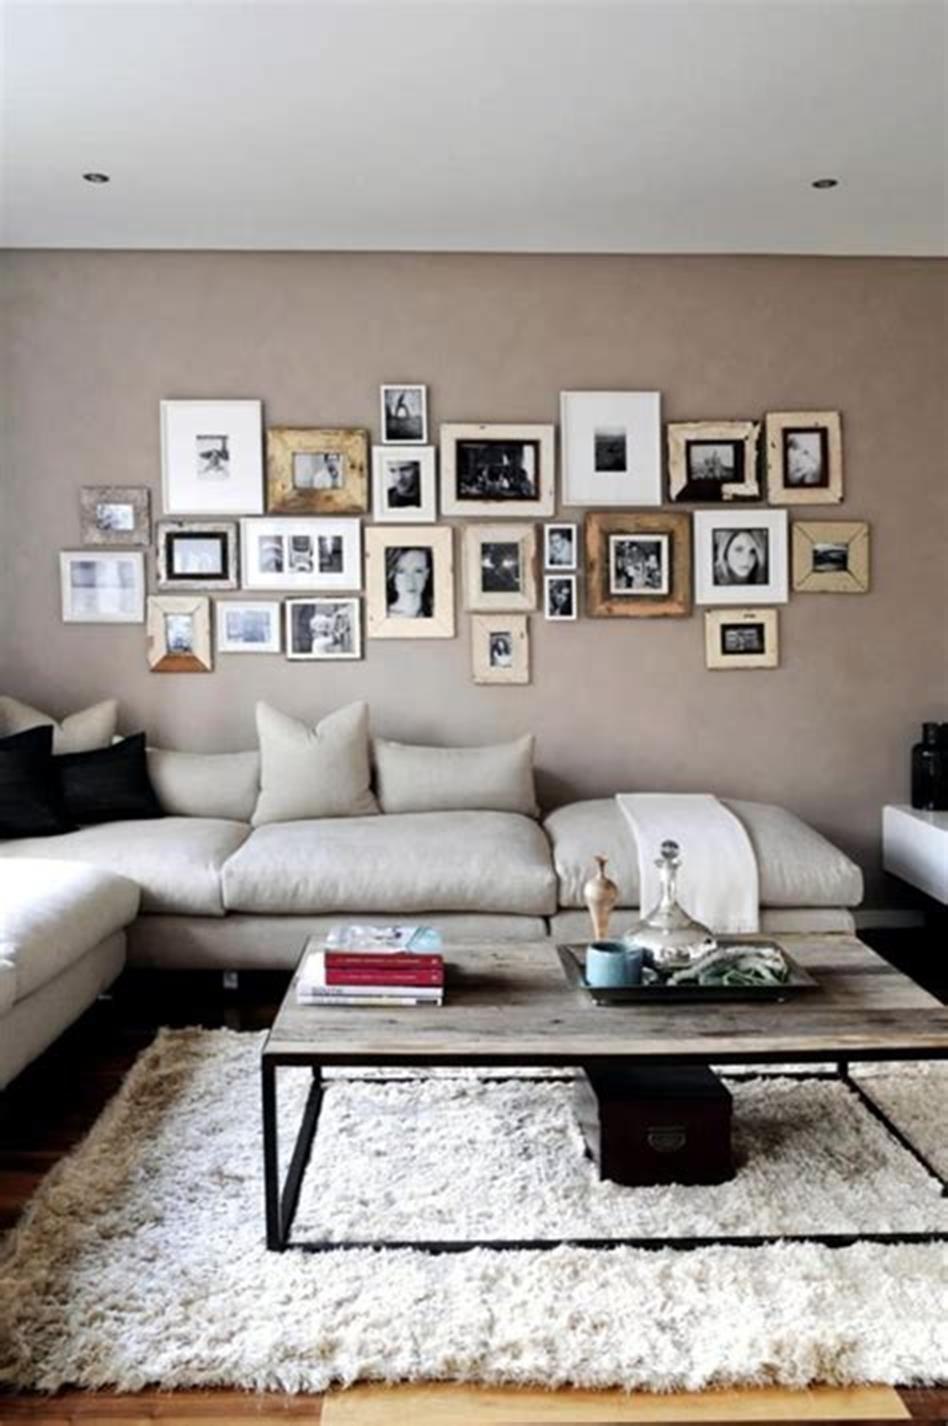 Sofa Design For Small Living Room: 35 Creative Ways To Fill Living Room Corner Ideas 11